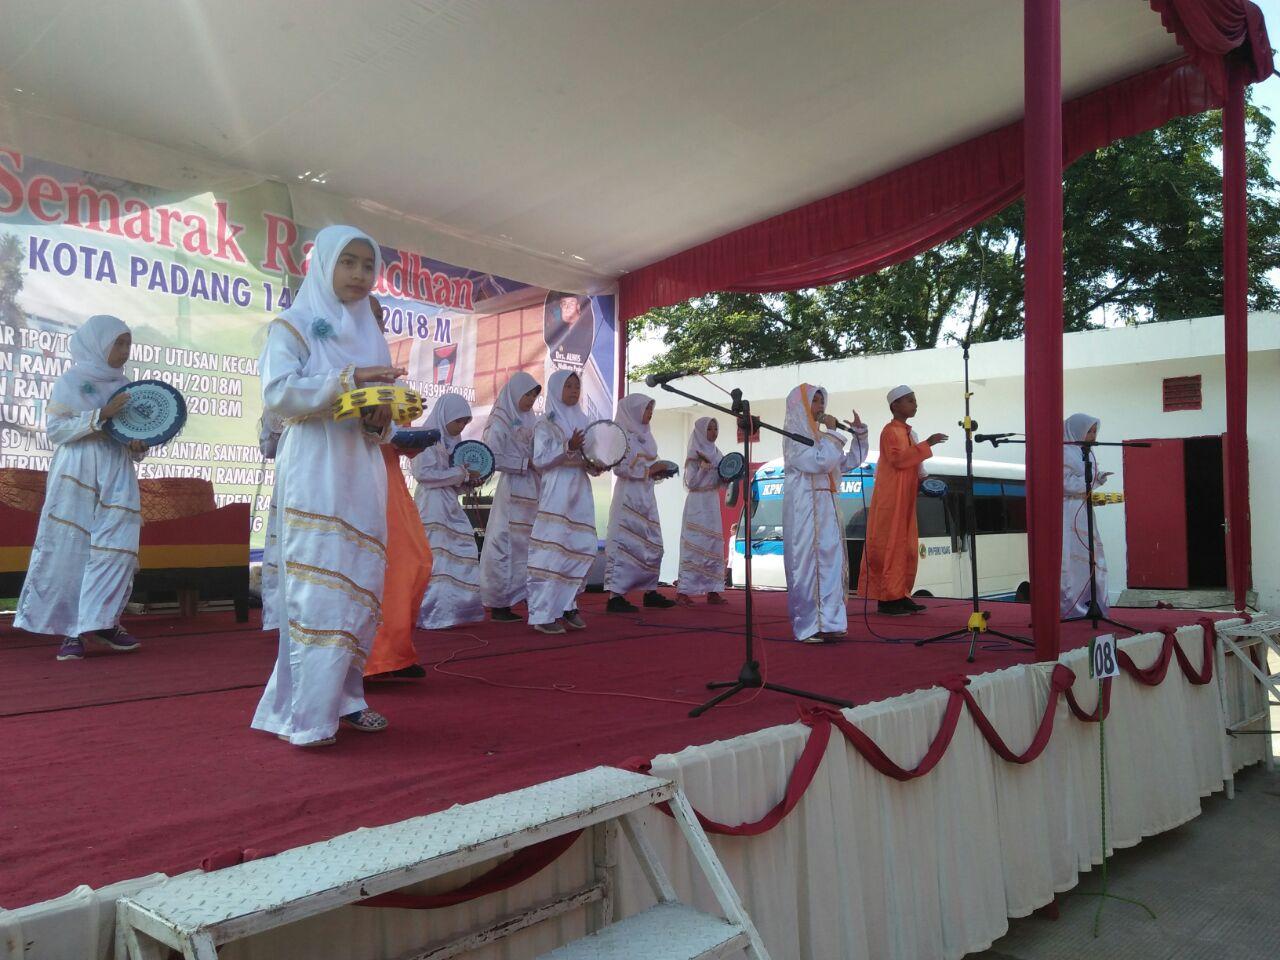 Bks Tpq Nanggalo Ikut Festival Semarak Ramadhan Di Balai Kota Padang Kementerian Agama Provinsi Sumatera Barat